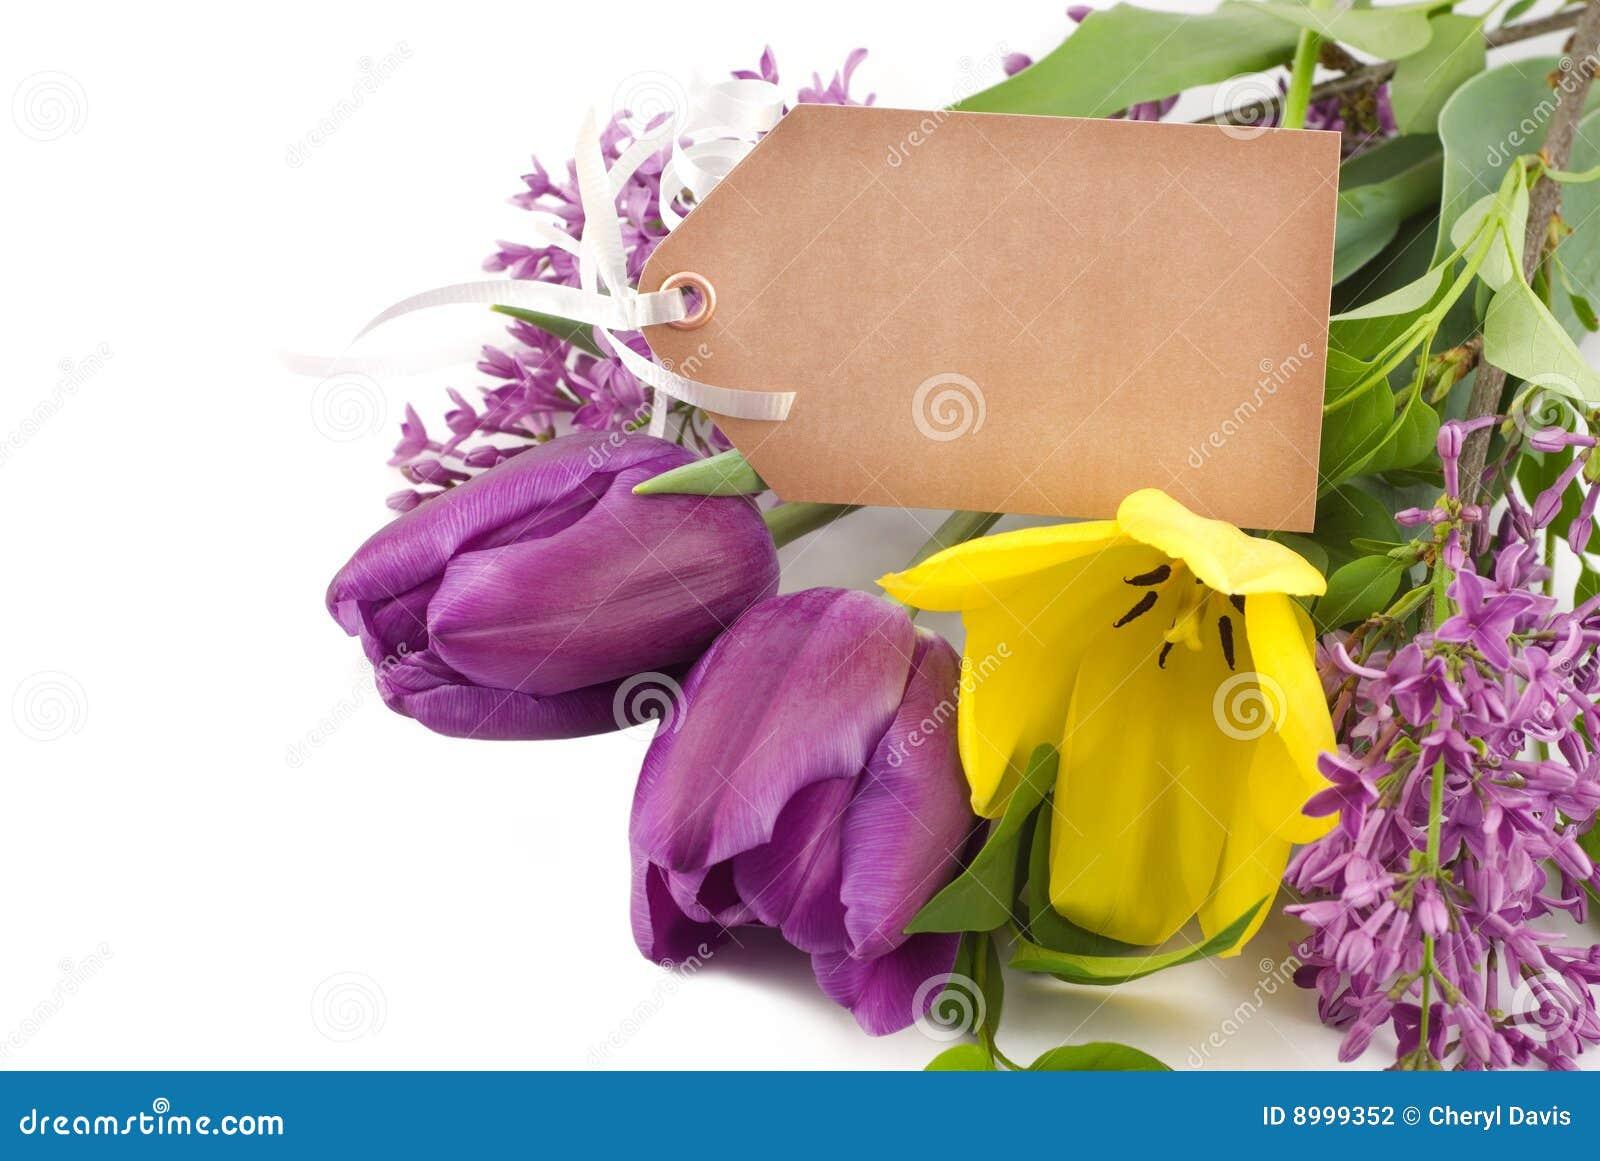 fr hlings tulpen und flieder mit marke stockfotografie bild 8999352. Black Bedroom Furniture Sets. Home Design Ideas